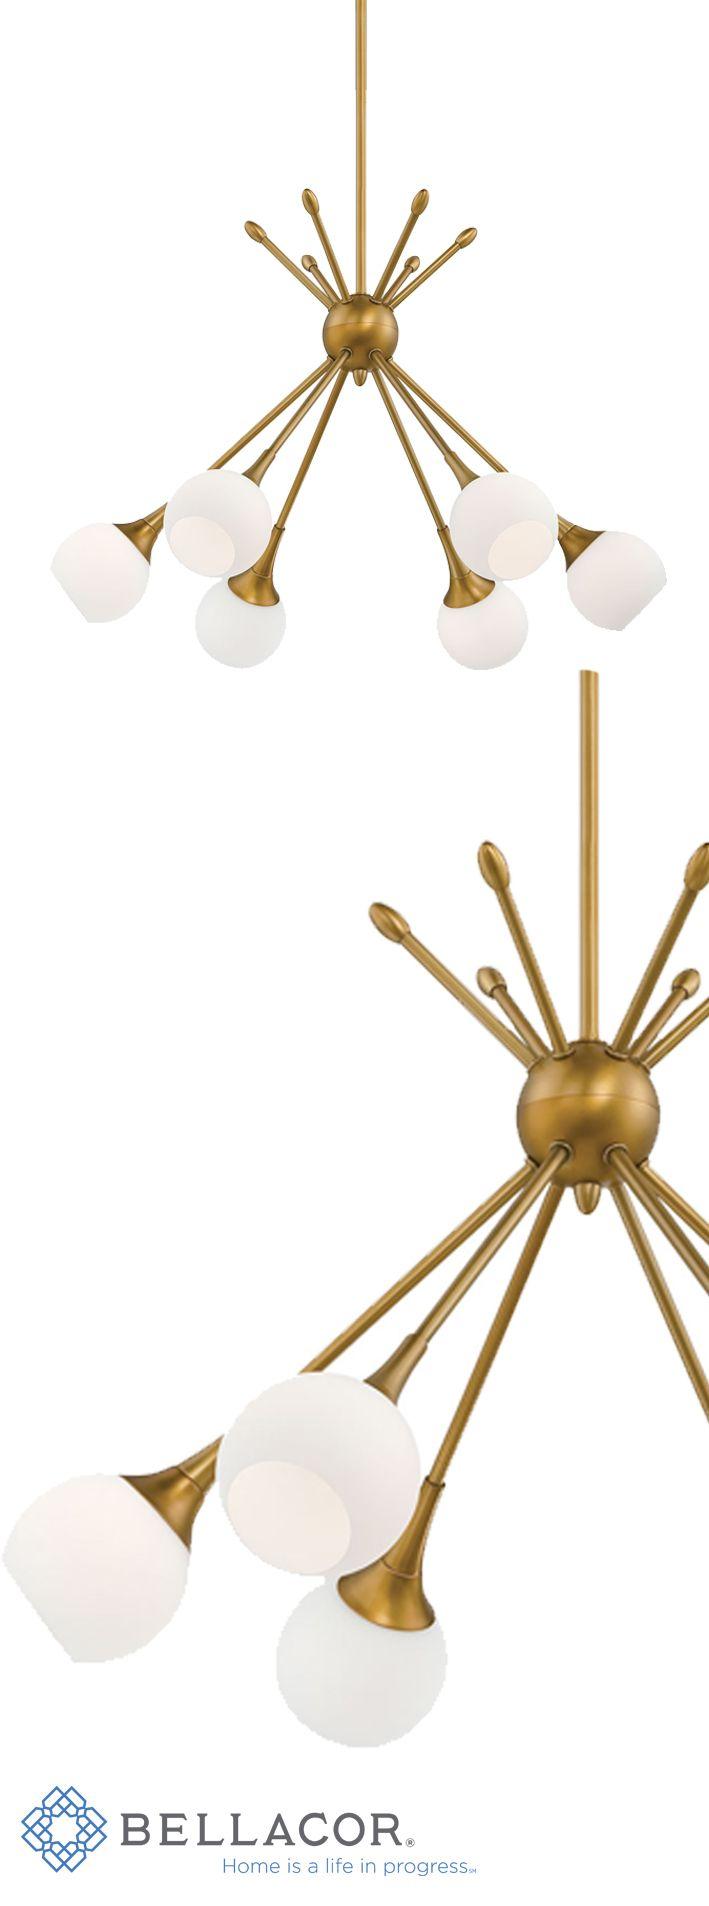 George kovacs by minka bath art vanity light with case etched opal - George Kovacs Pontil Honey Gold Six Light Chandelier